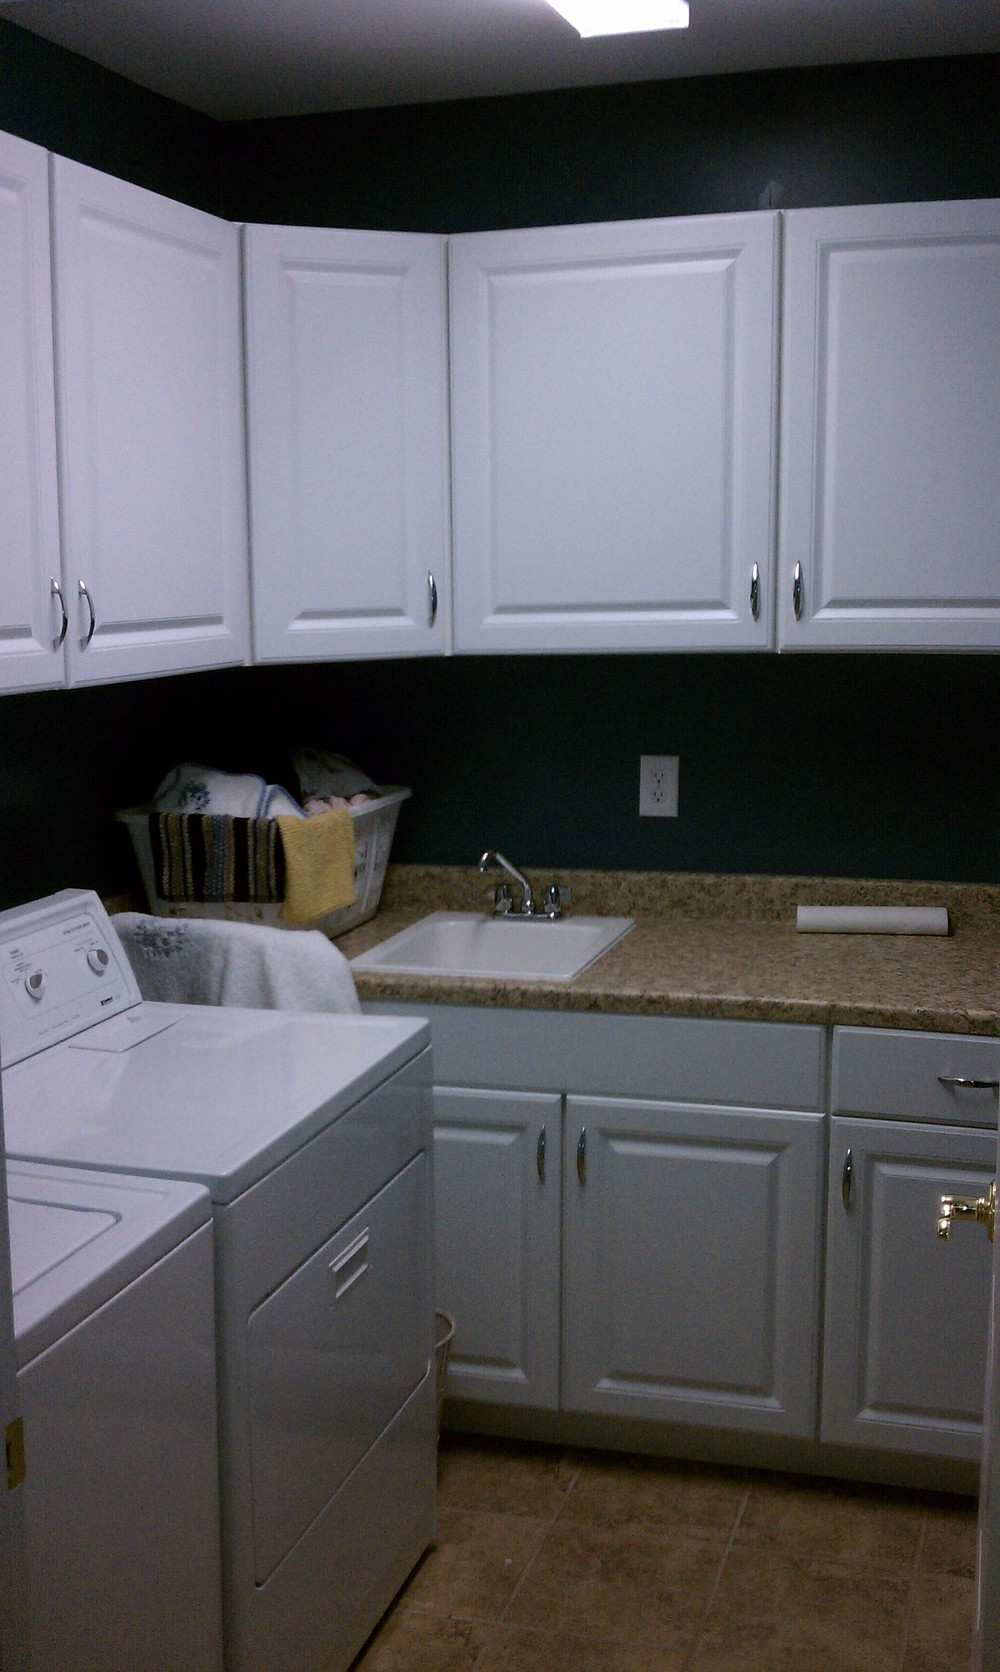 Grosebeck Laundry Cabinet Installation